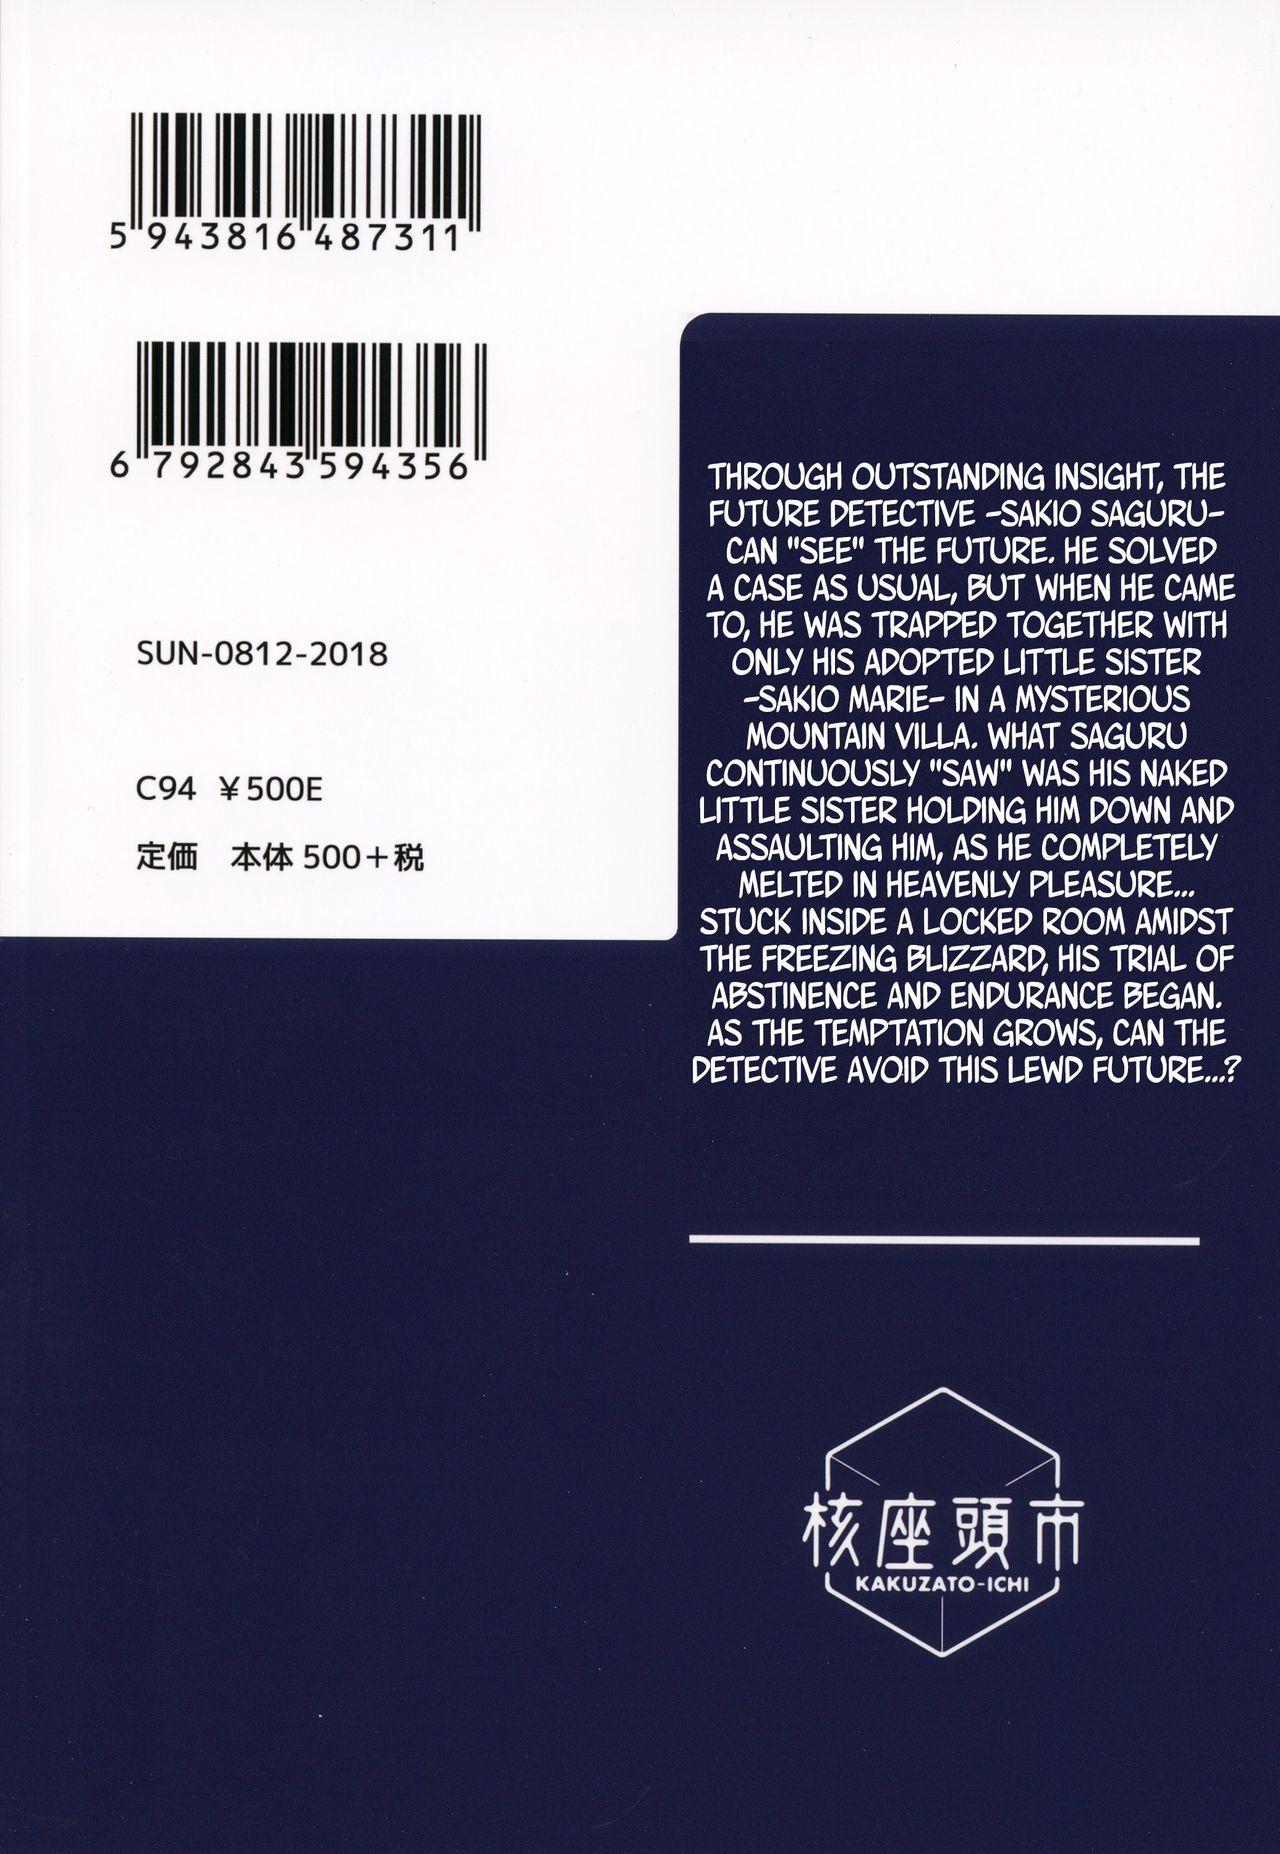 Mirai Tantei Nankin Jiken | Future Detective: The House Confinement Incident 29